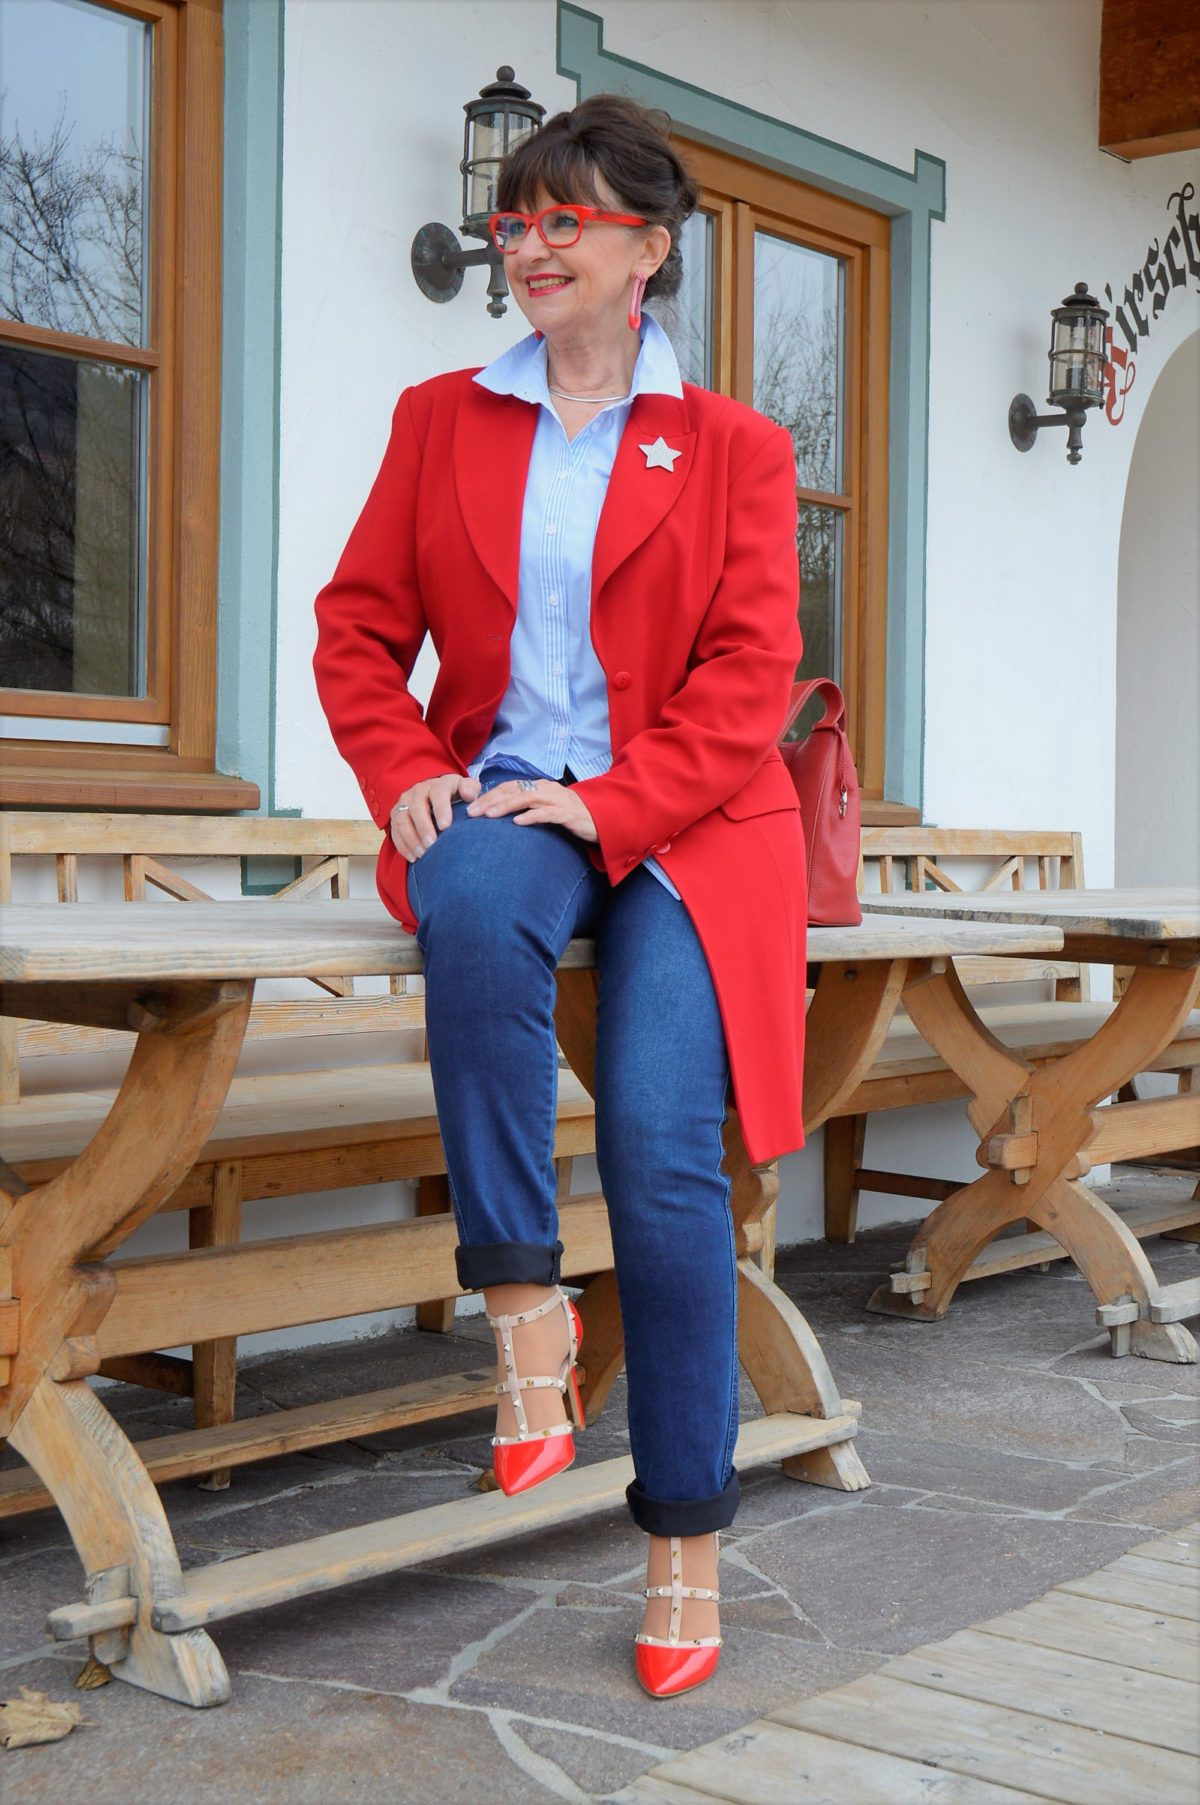 Blaue Bluse roter Mantel